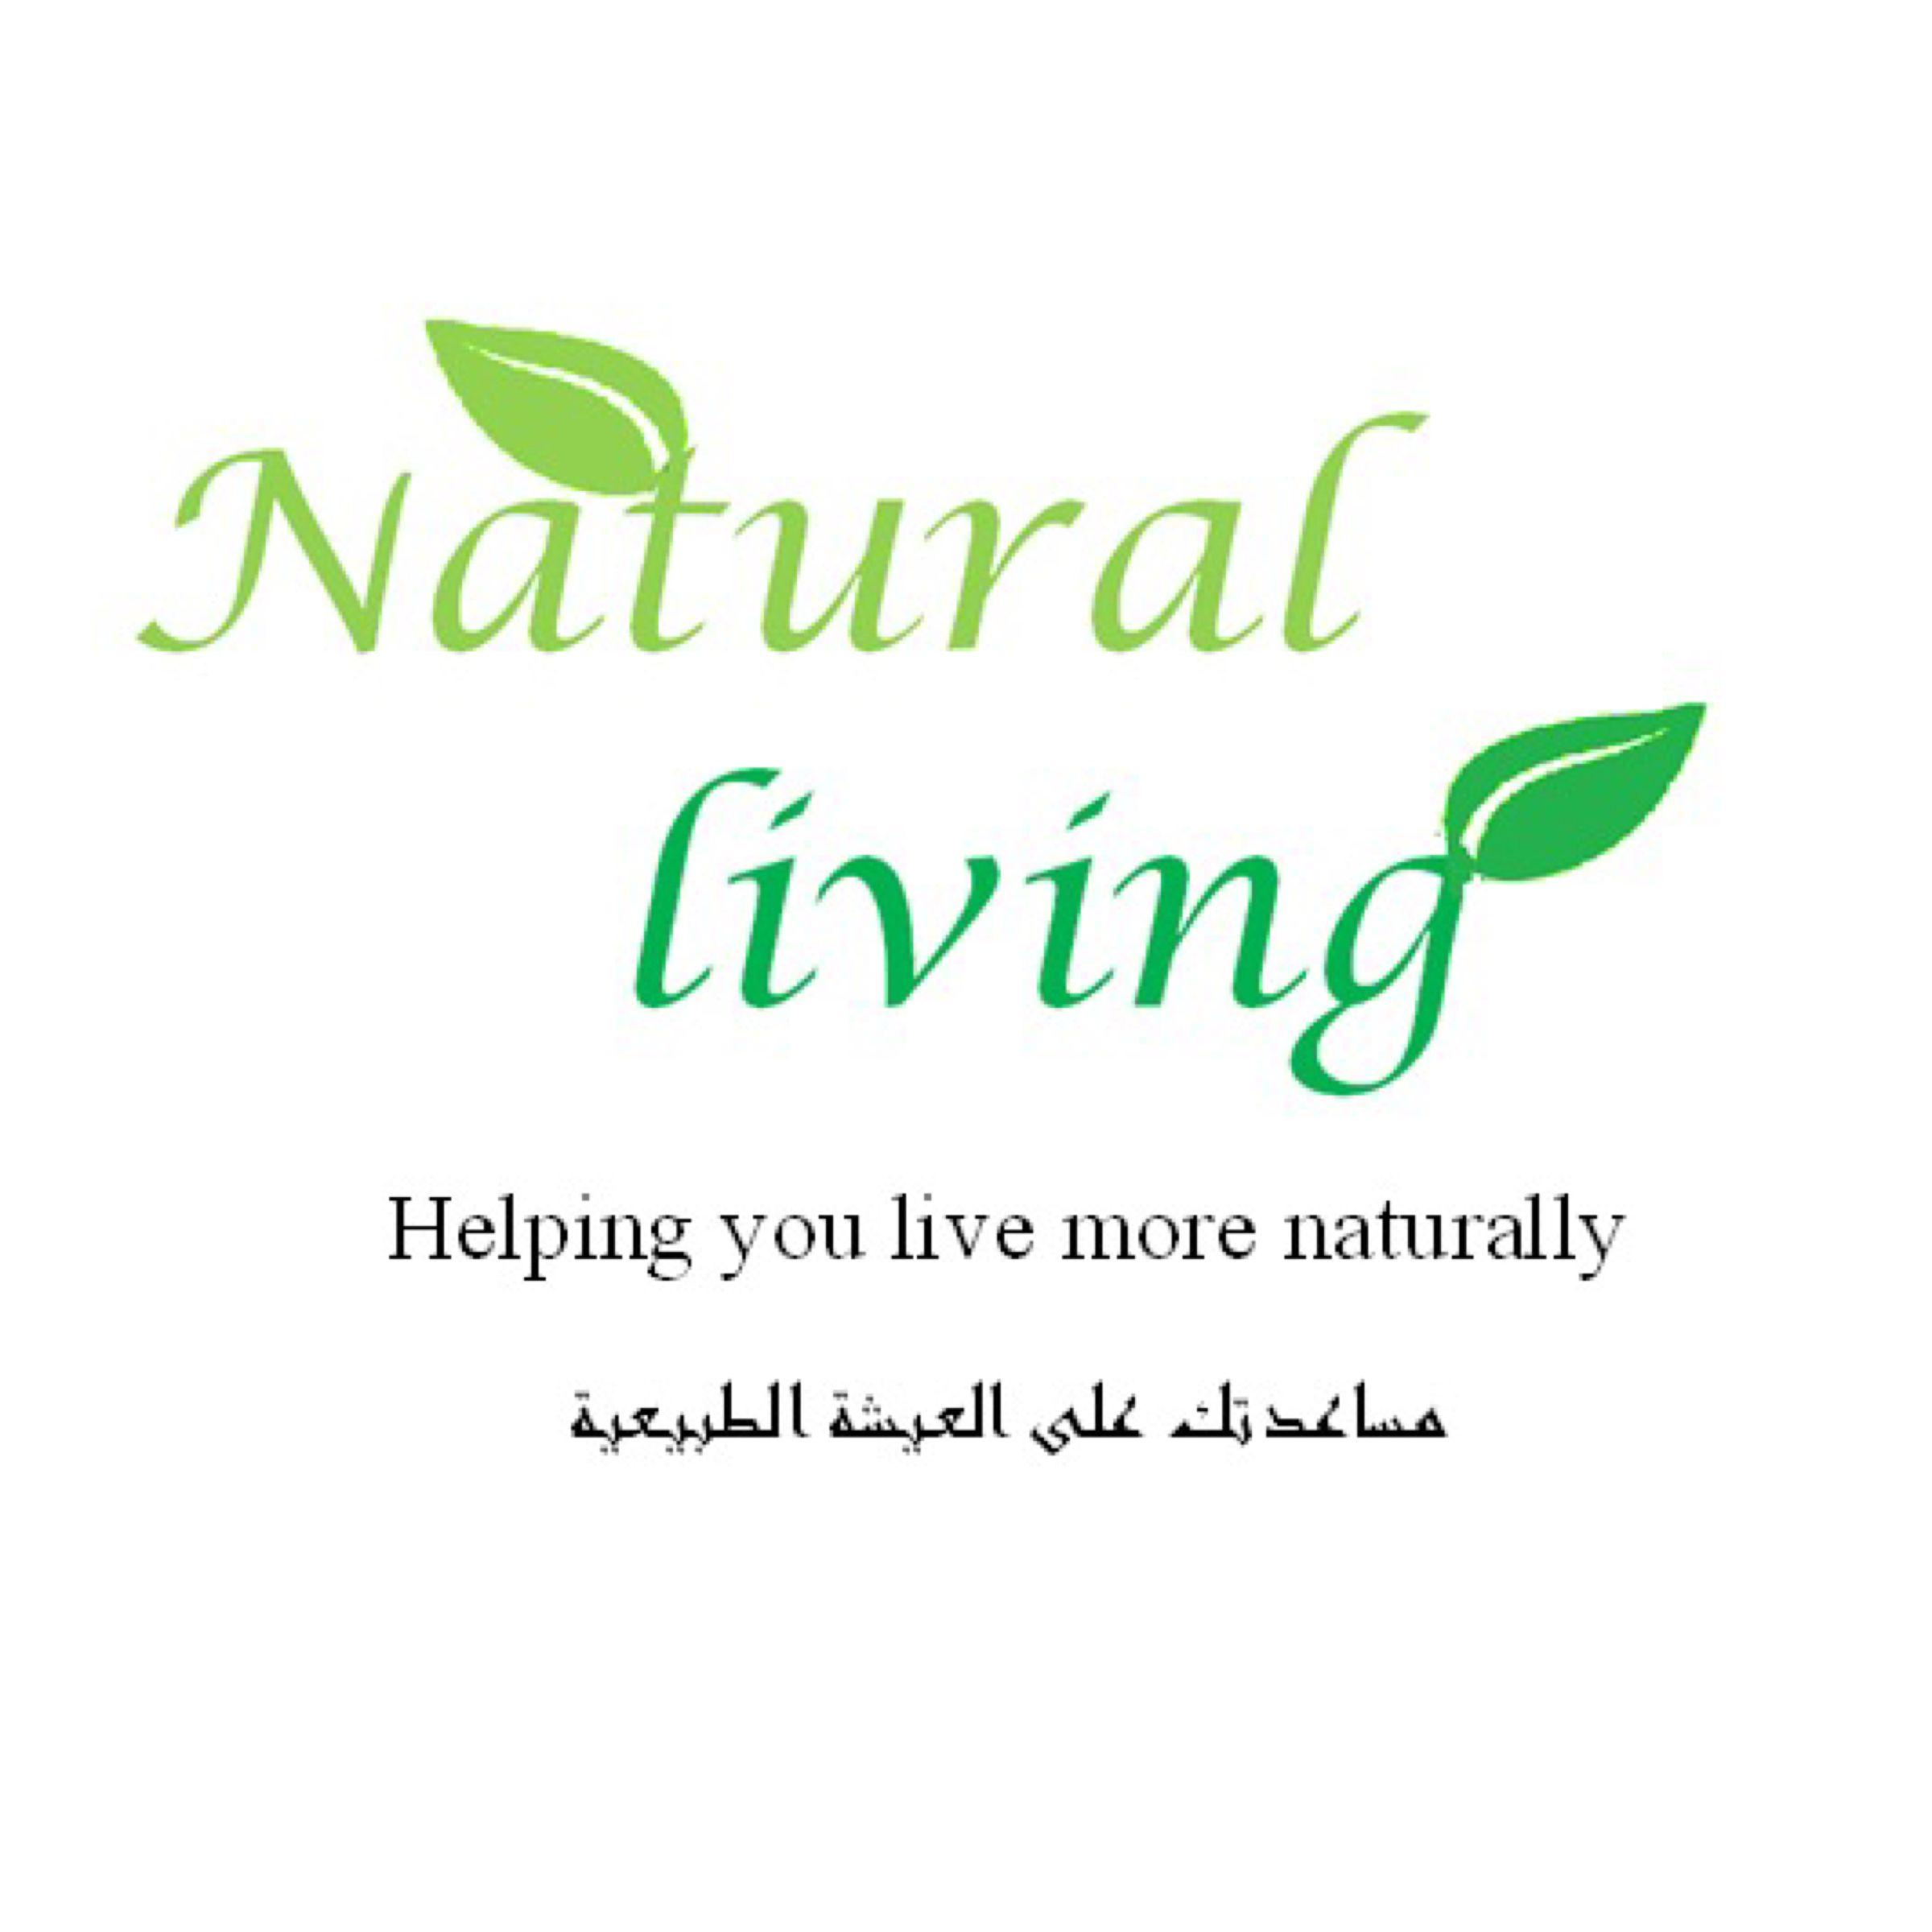 e6e5109d65b18 Natural Living (Riyadh, Saudi Arabia) We have Natural soaps & skin care  products